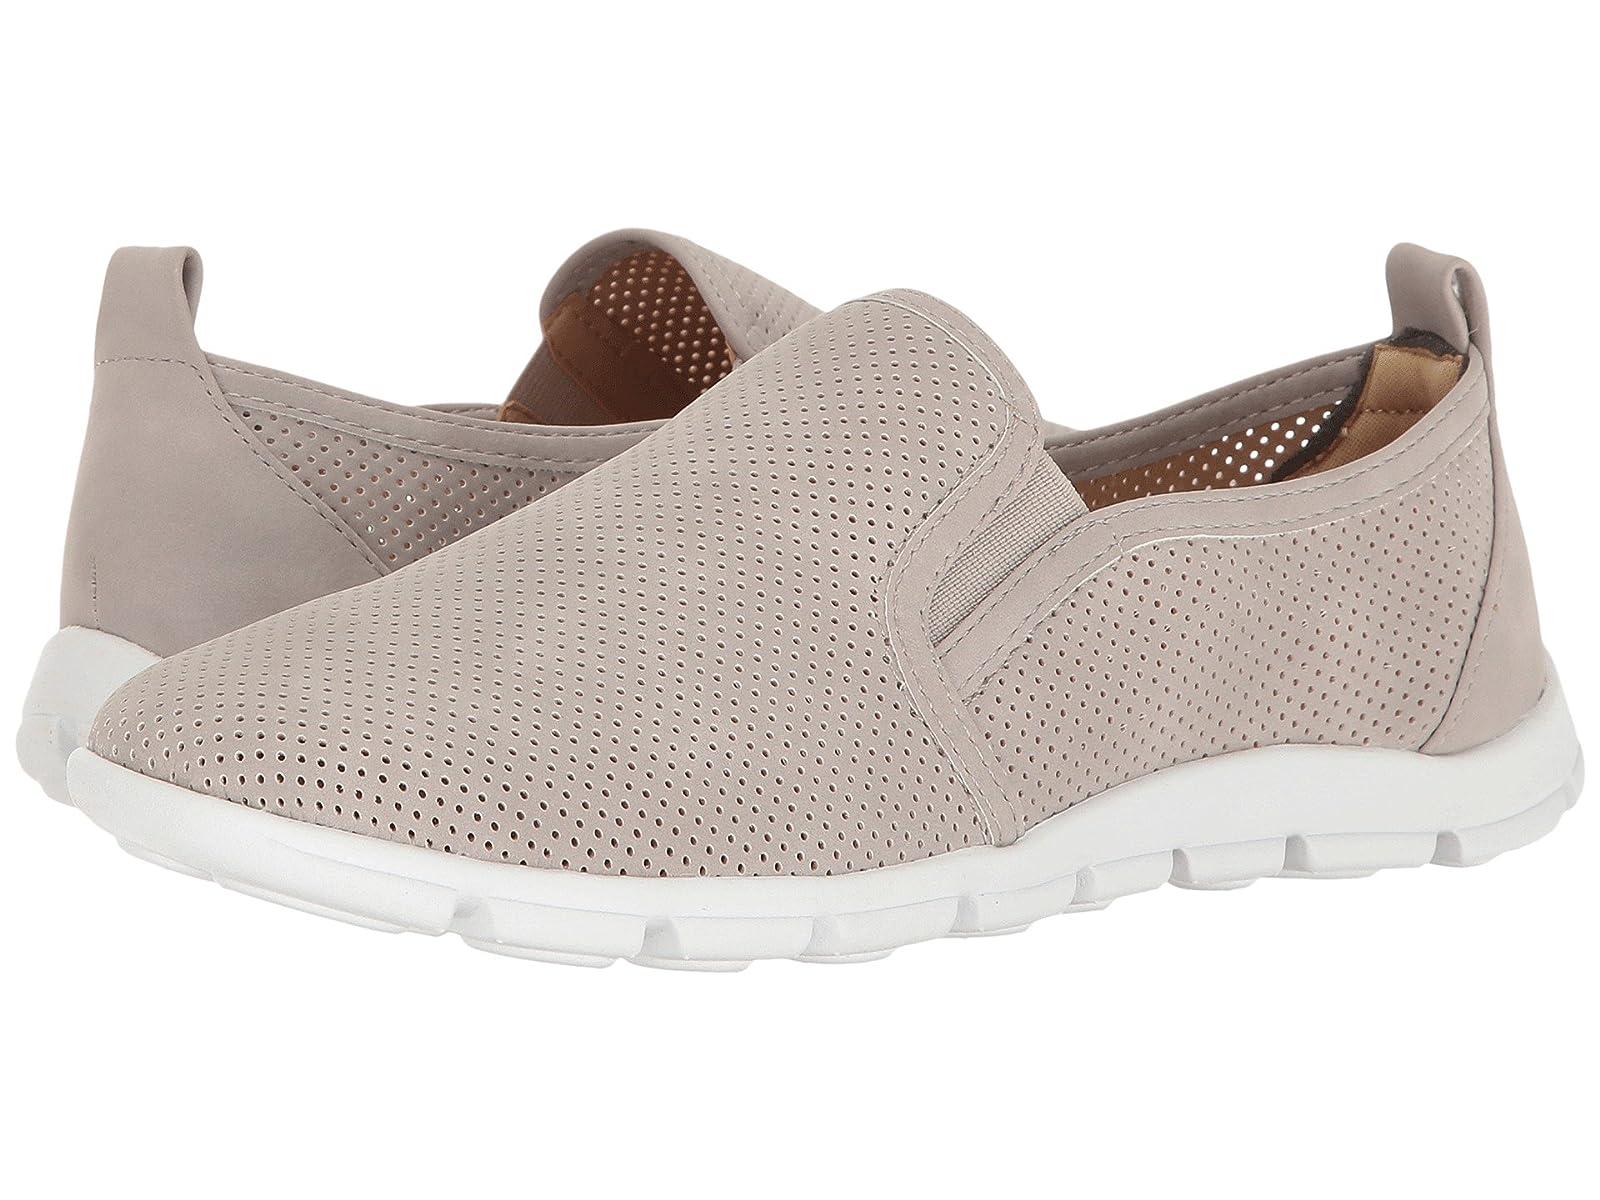 EuroSoft CardeaCheap and distinctive eye-catching shoes